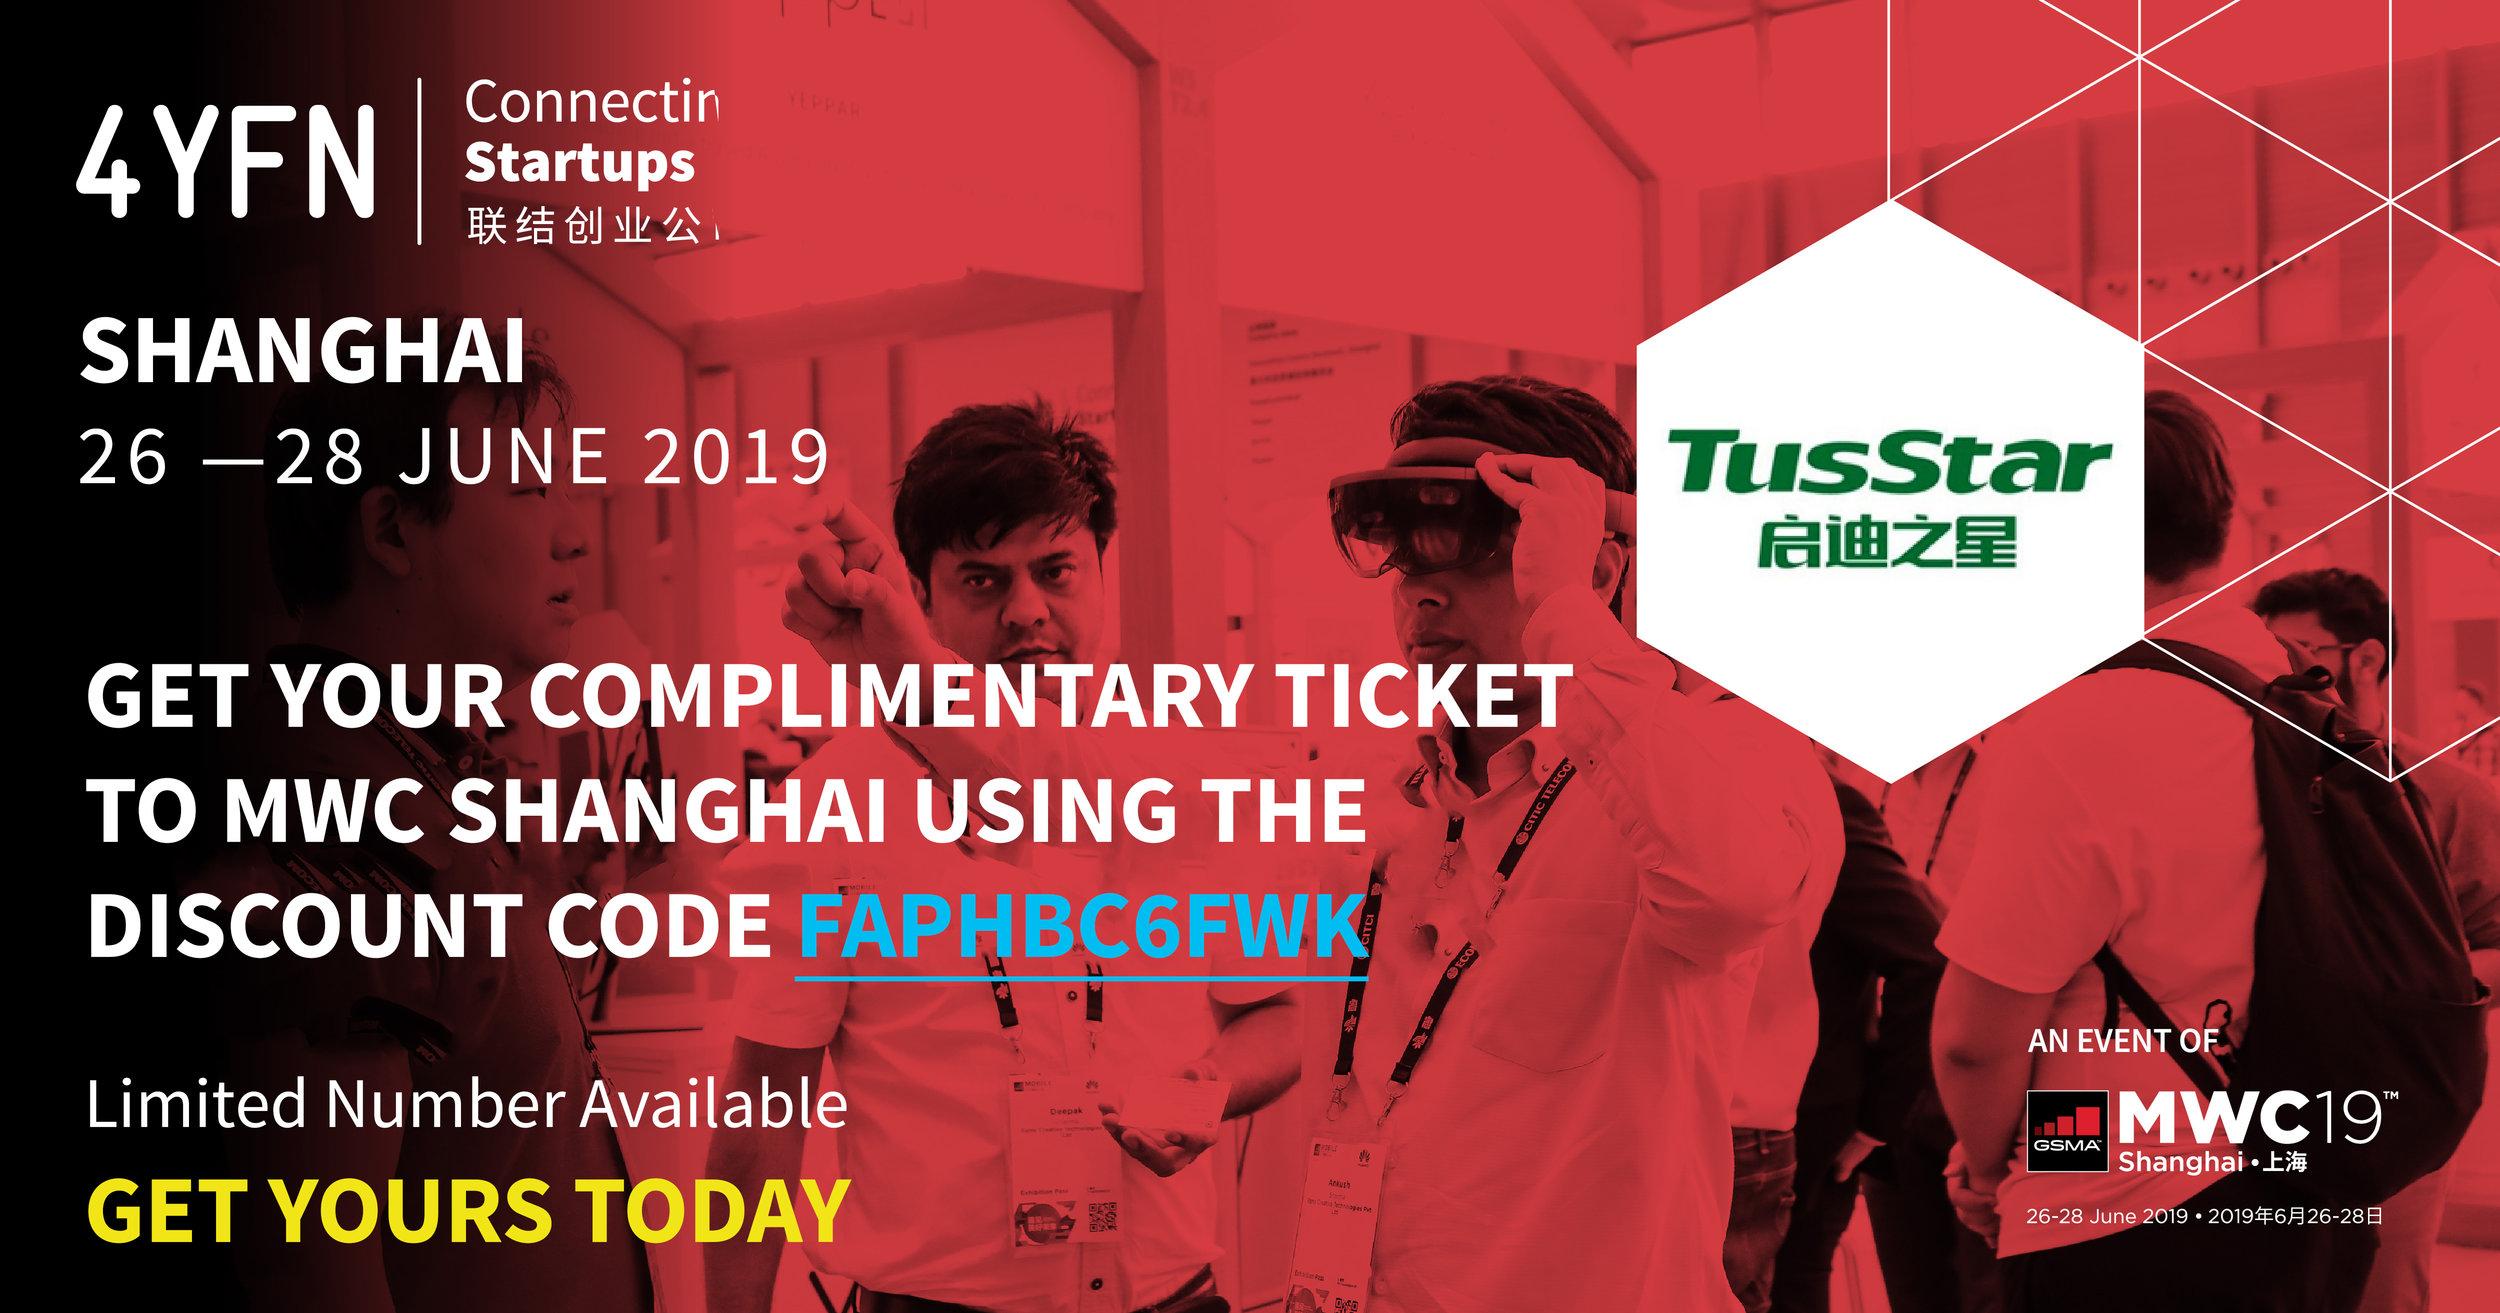 banners_shanghai_communities-discount-TUSSTAR.jpg